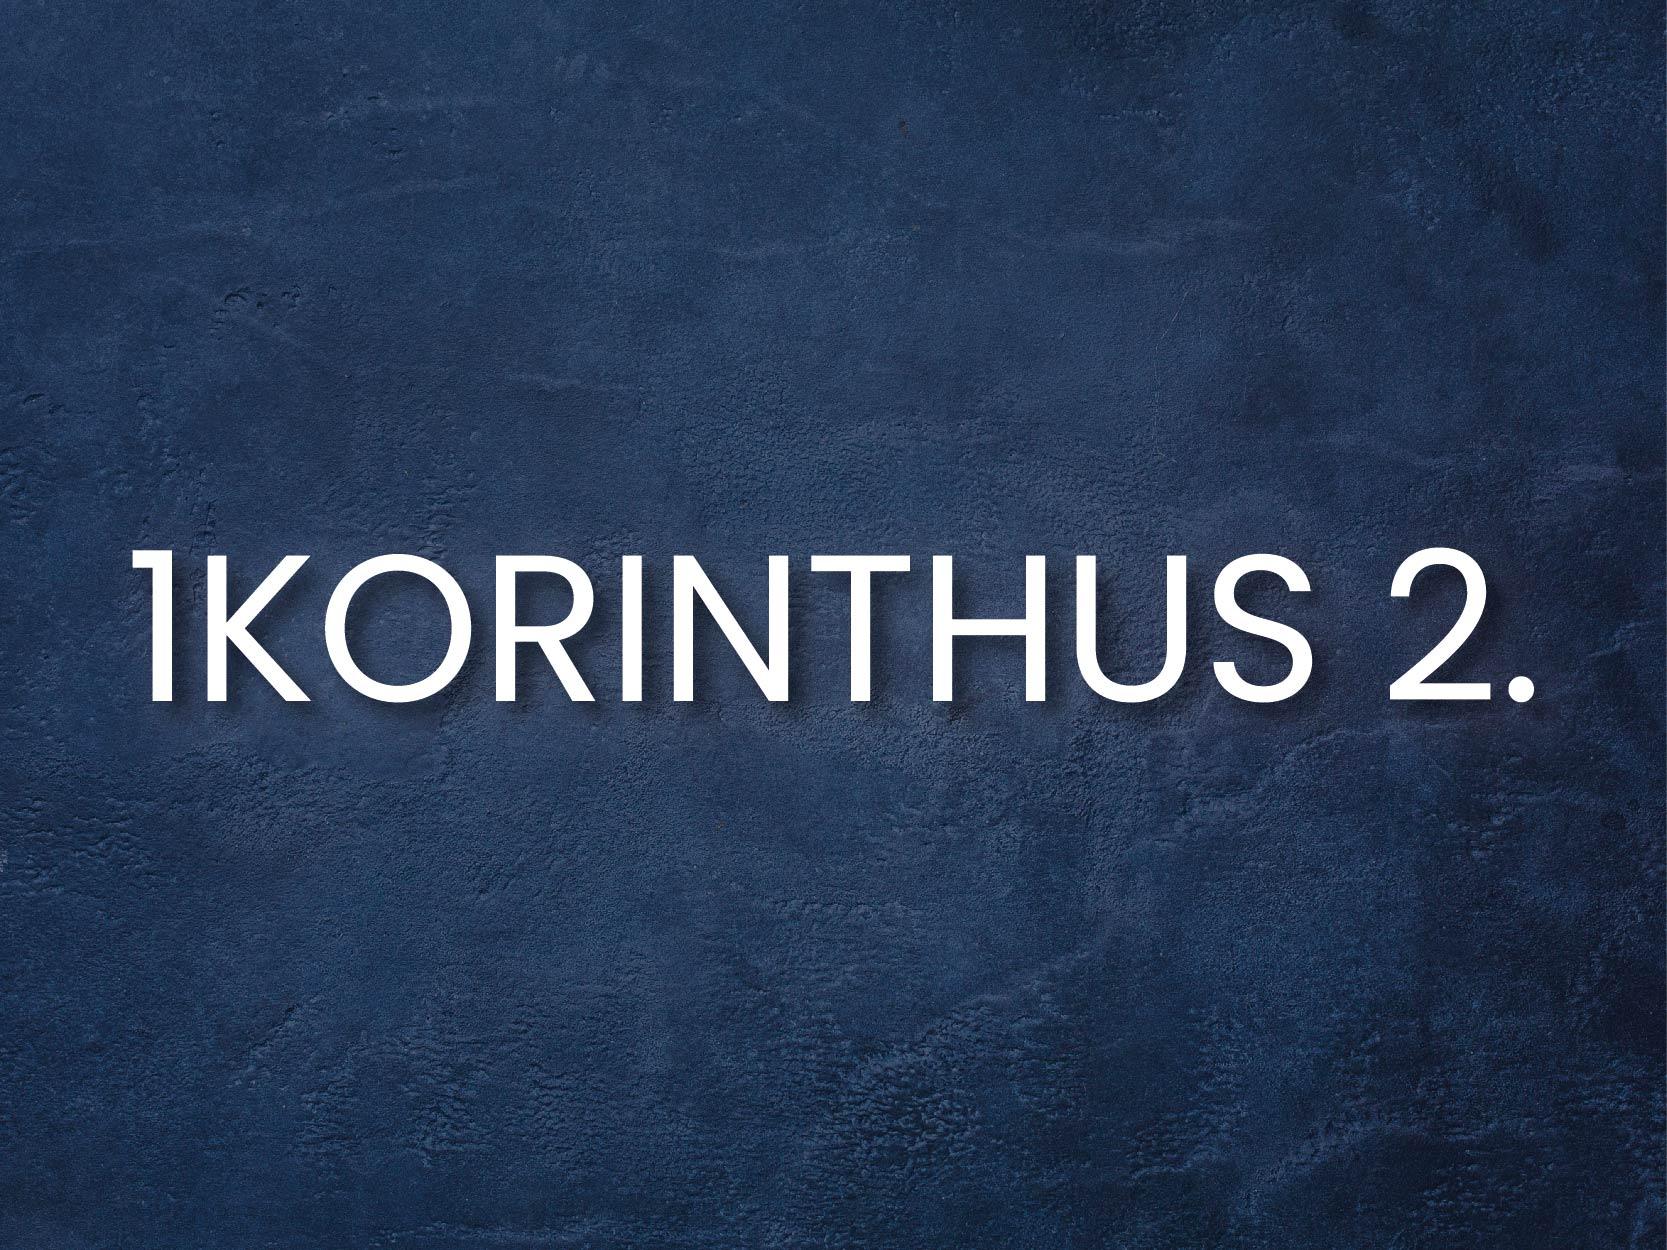 INFO_korinthus_2